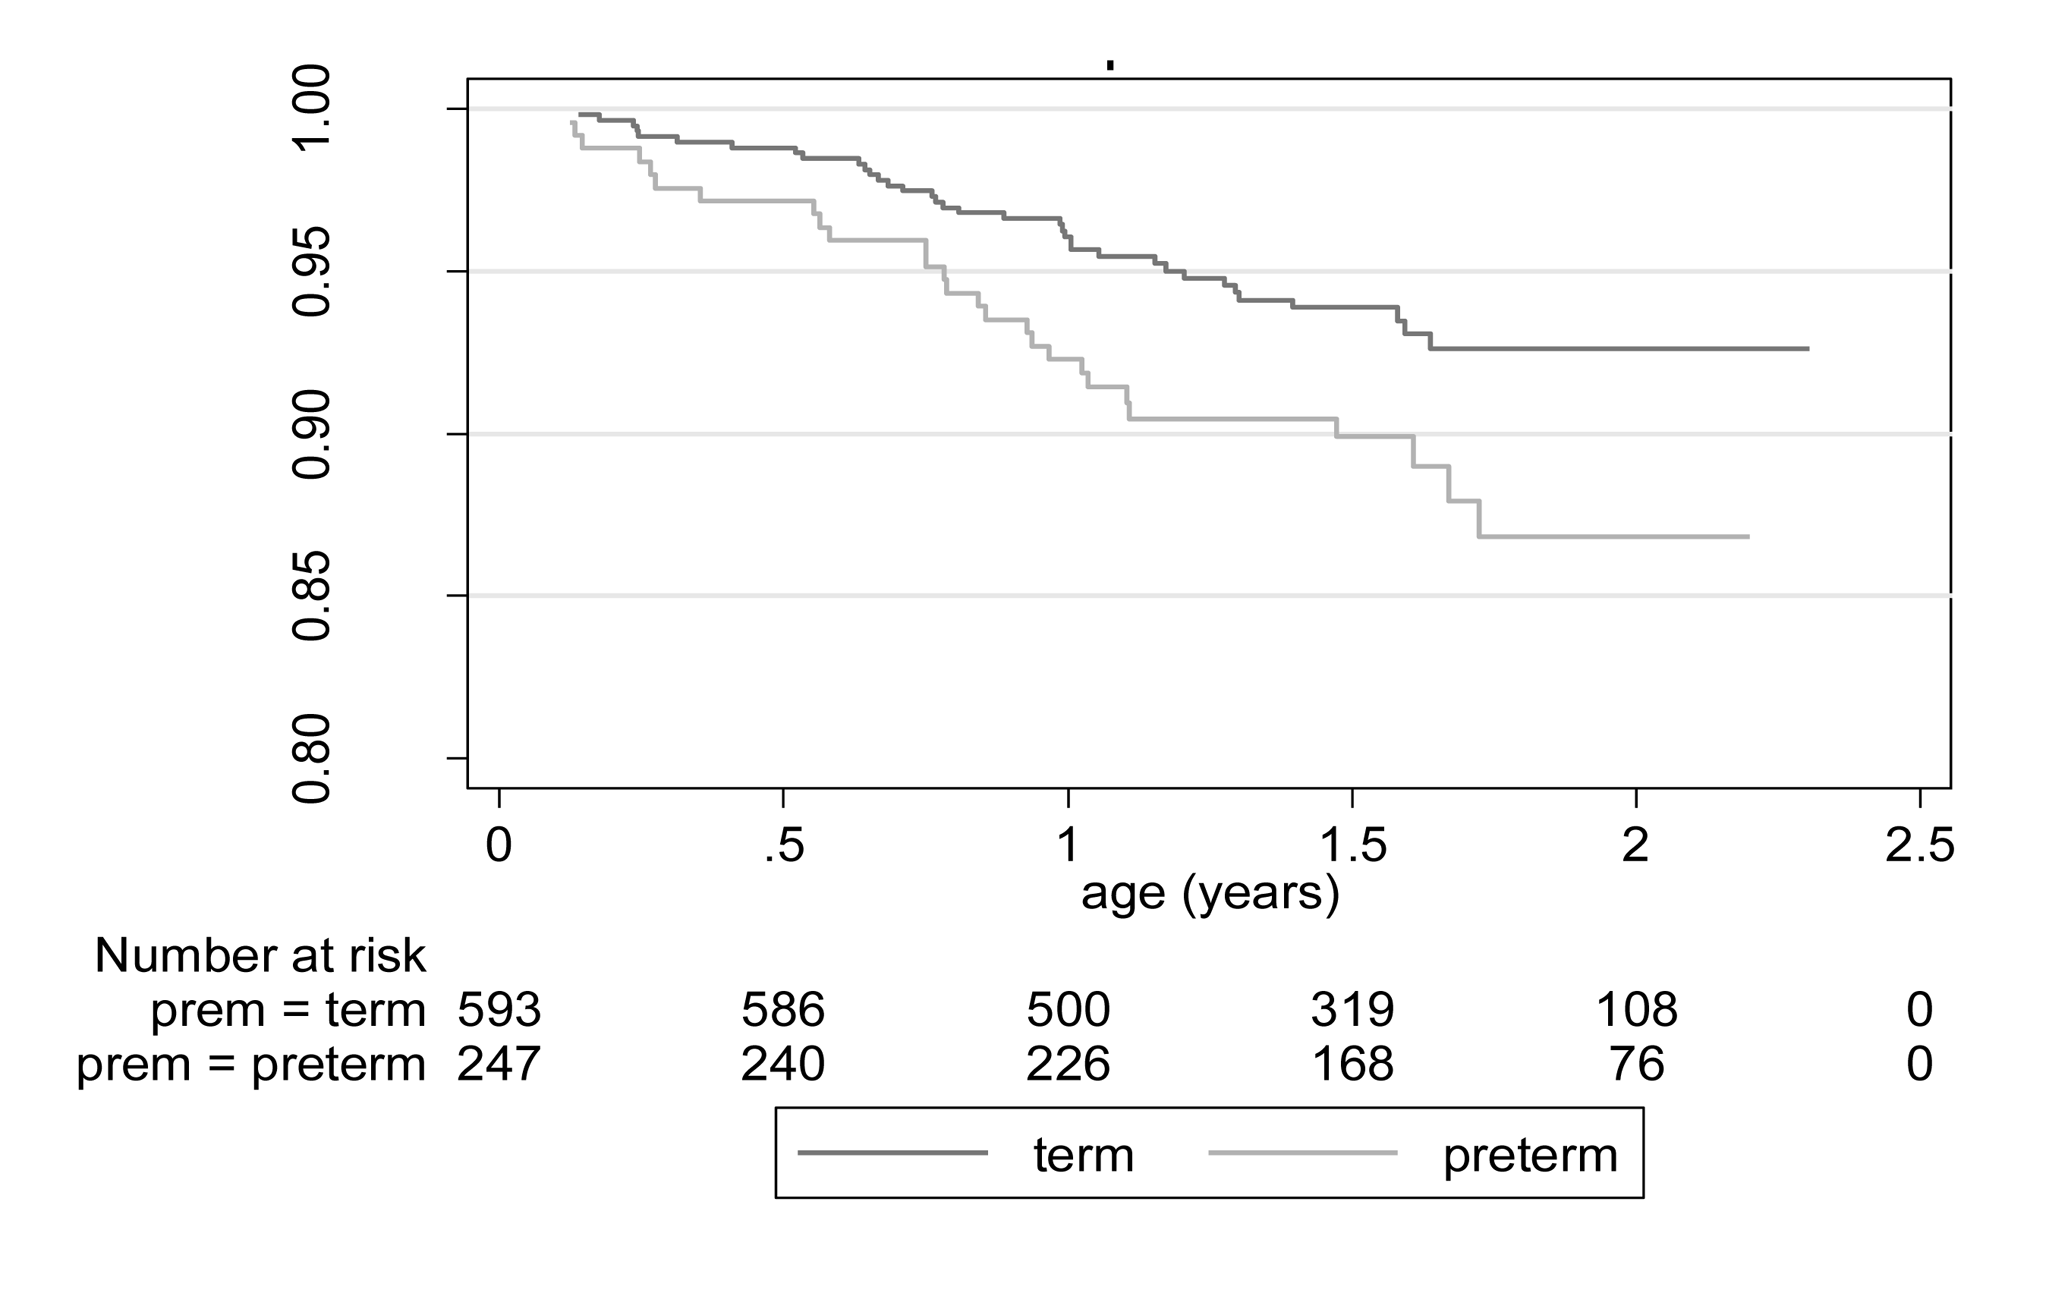 Kaplan Meyer curves: survival of post-neonatal infants born preterm and at term (likelihood ratio X<sup>2</sup> statistic: 5.05; <i>p</i>=0.02).